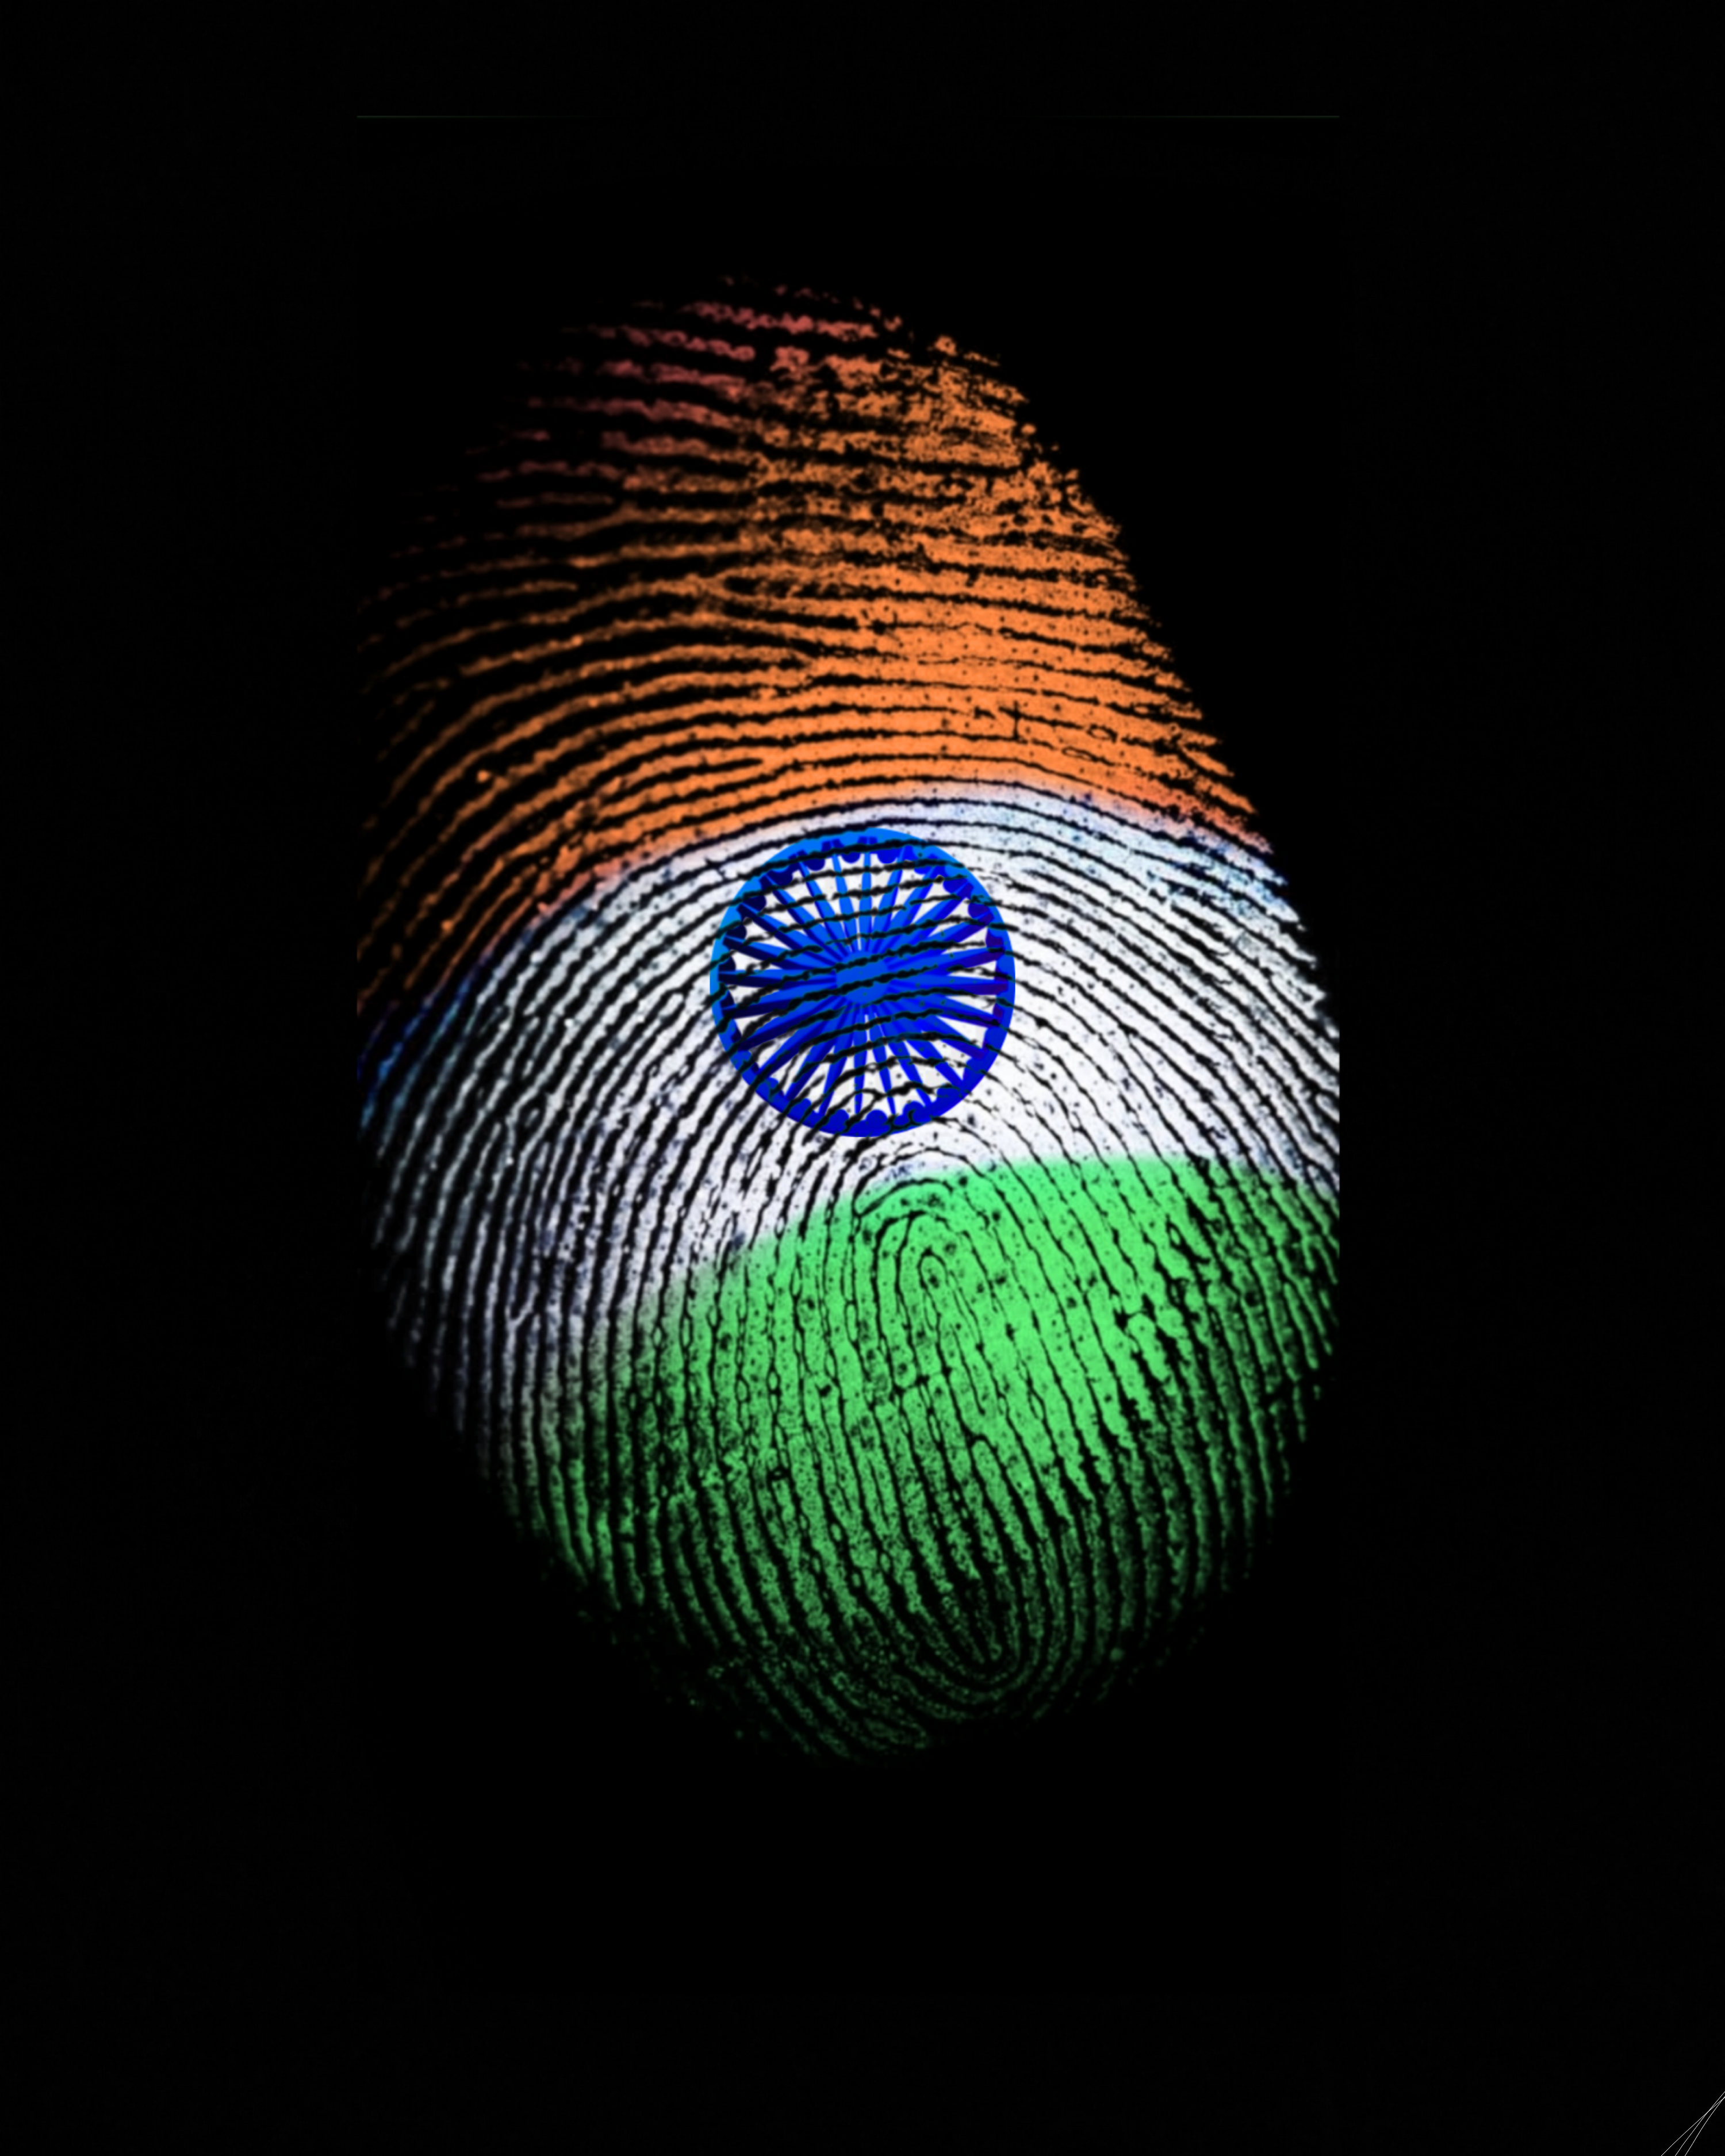 Indian flag as thumb impression